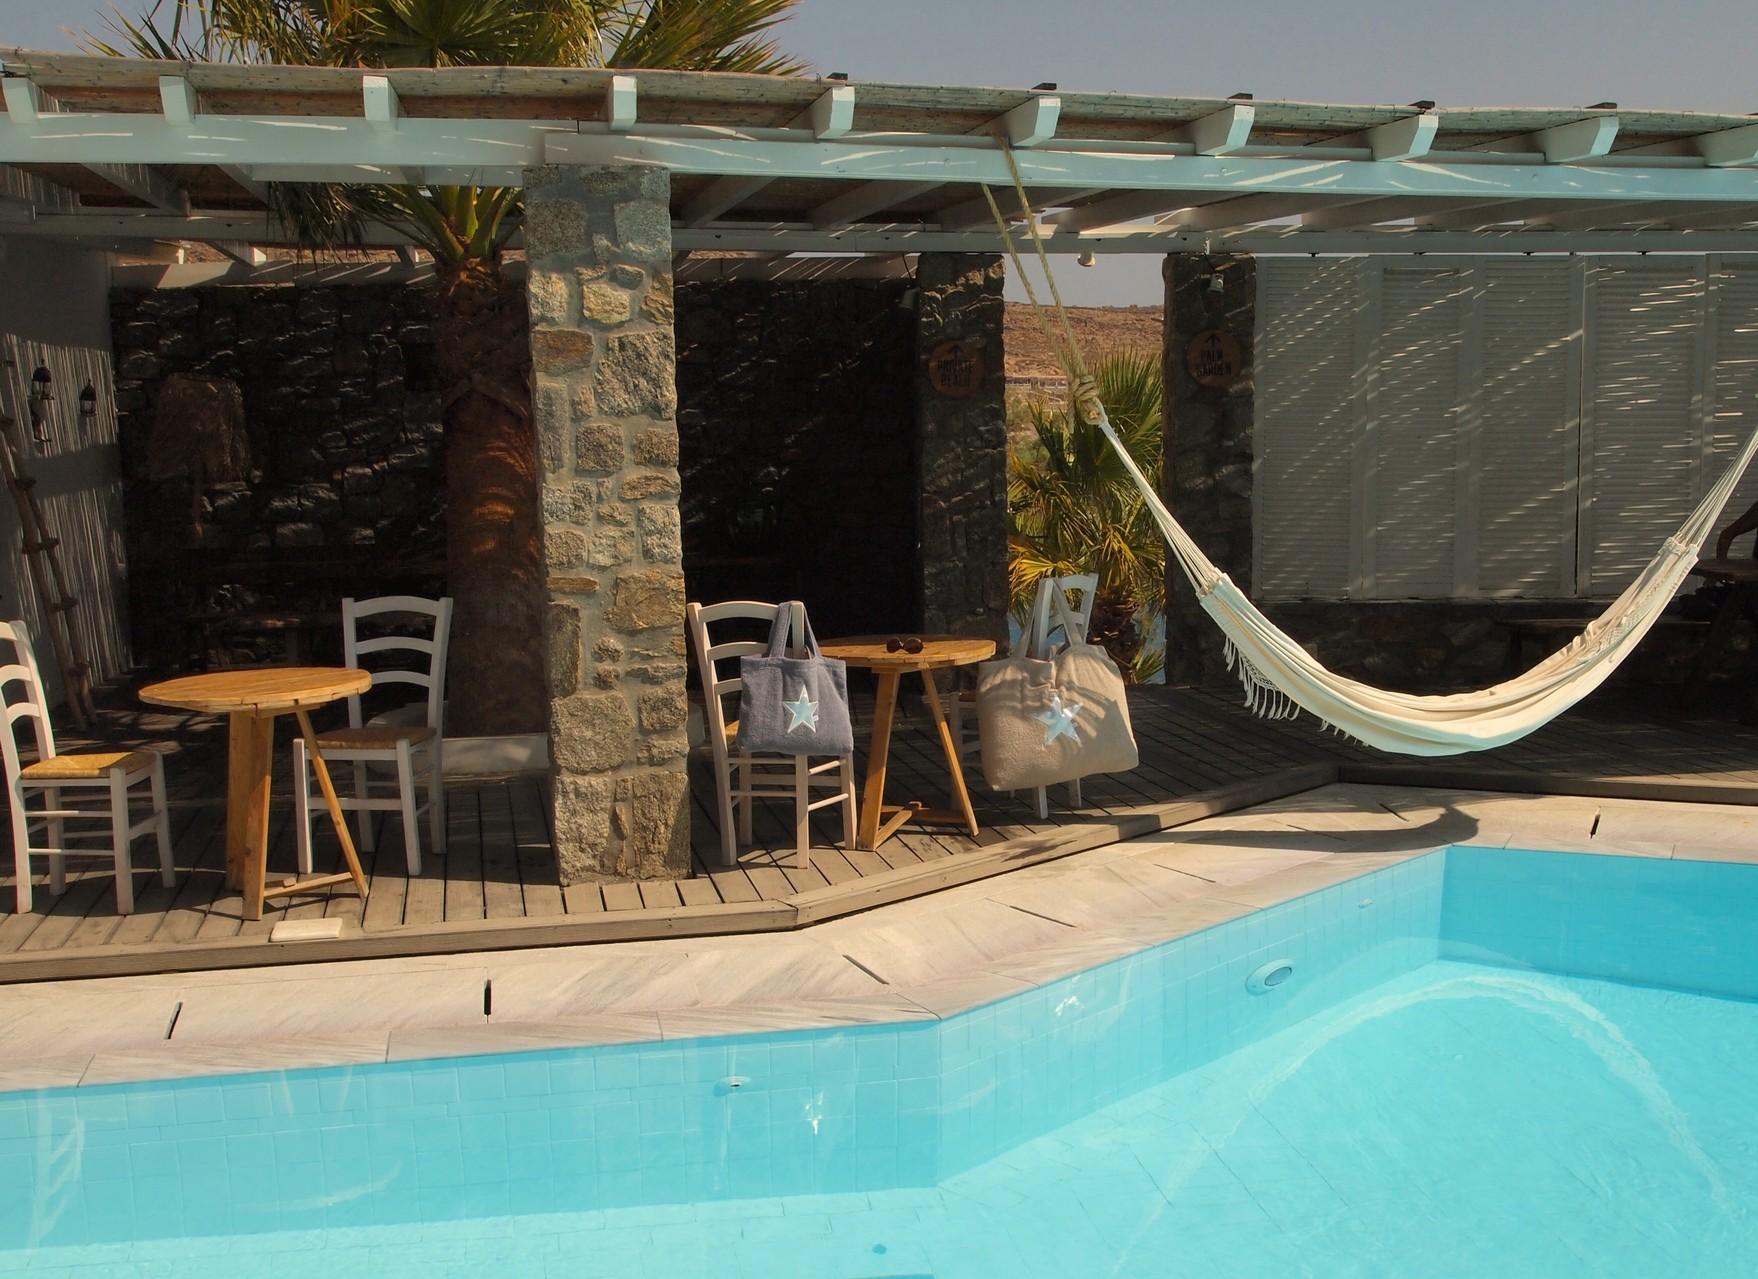 Mykonos - Hotel San Giorgio - Pool / Cantina - BYRH Beach Bags